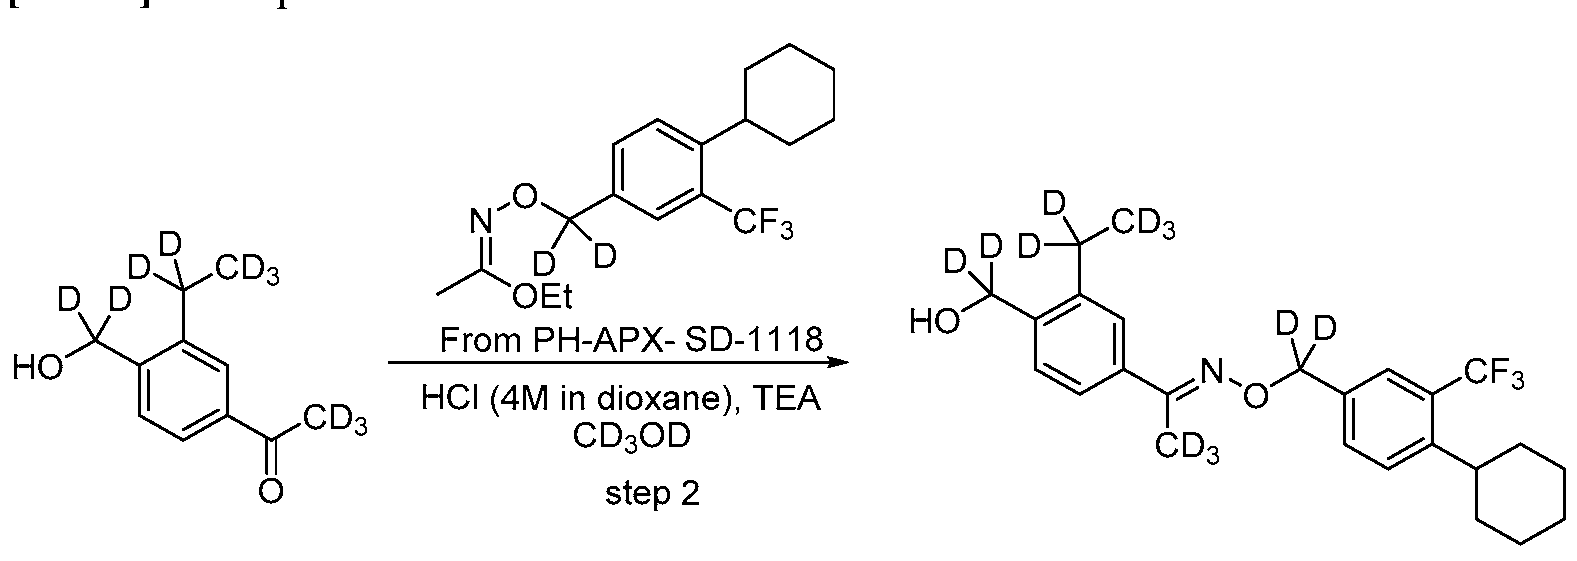 WO2017120124A1 - Azetidine modulators of the sphingosine 1-phosphate